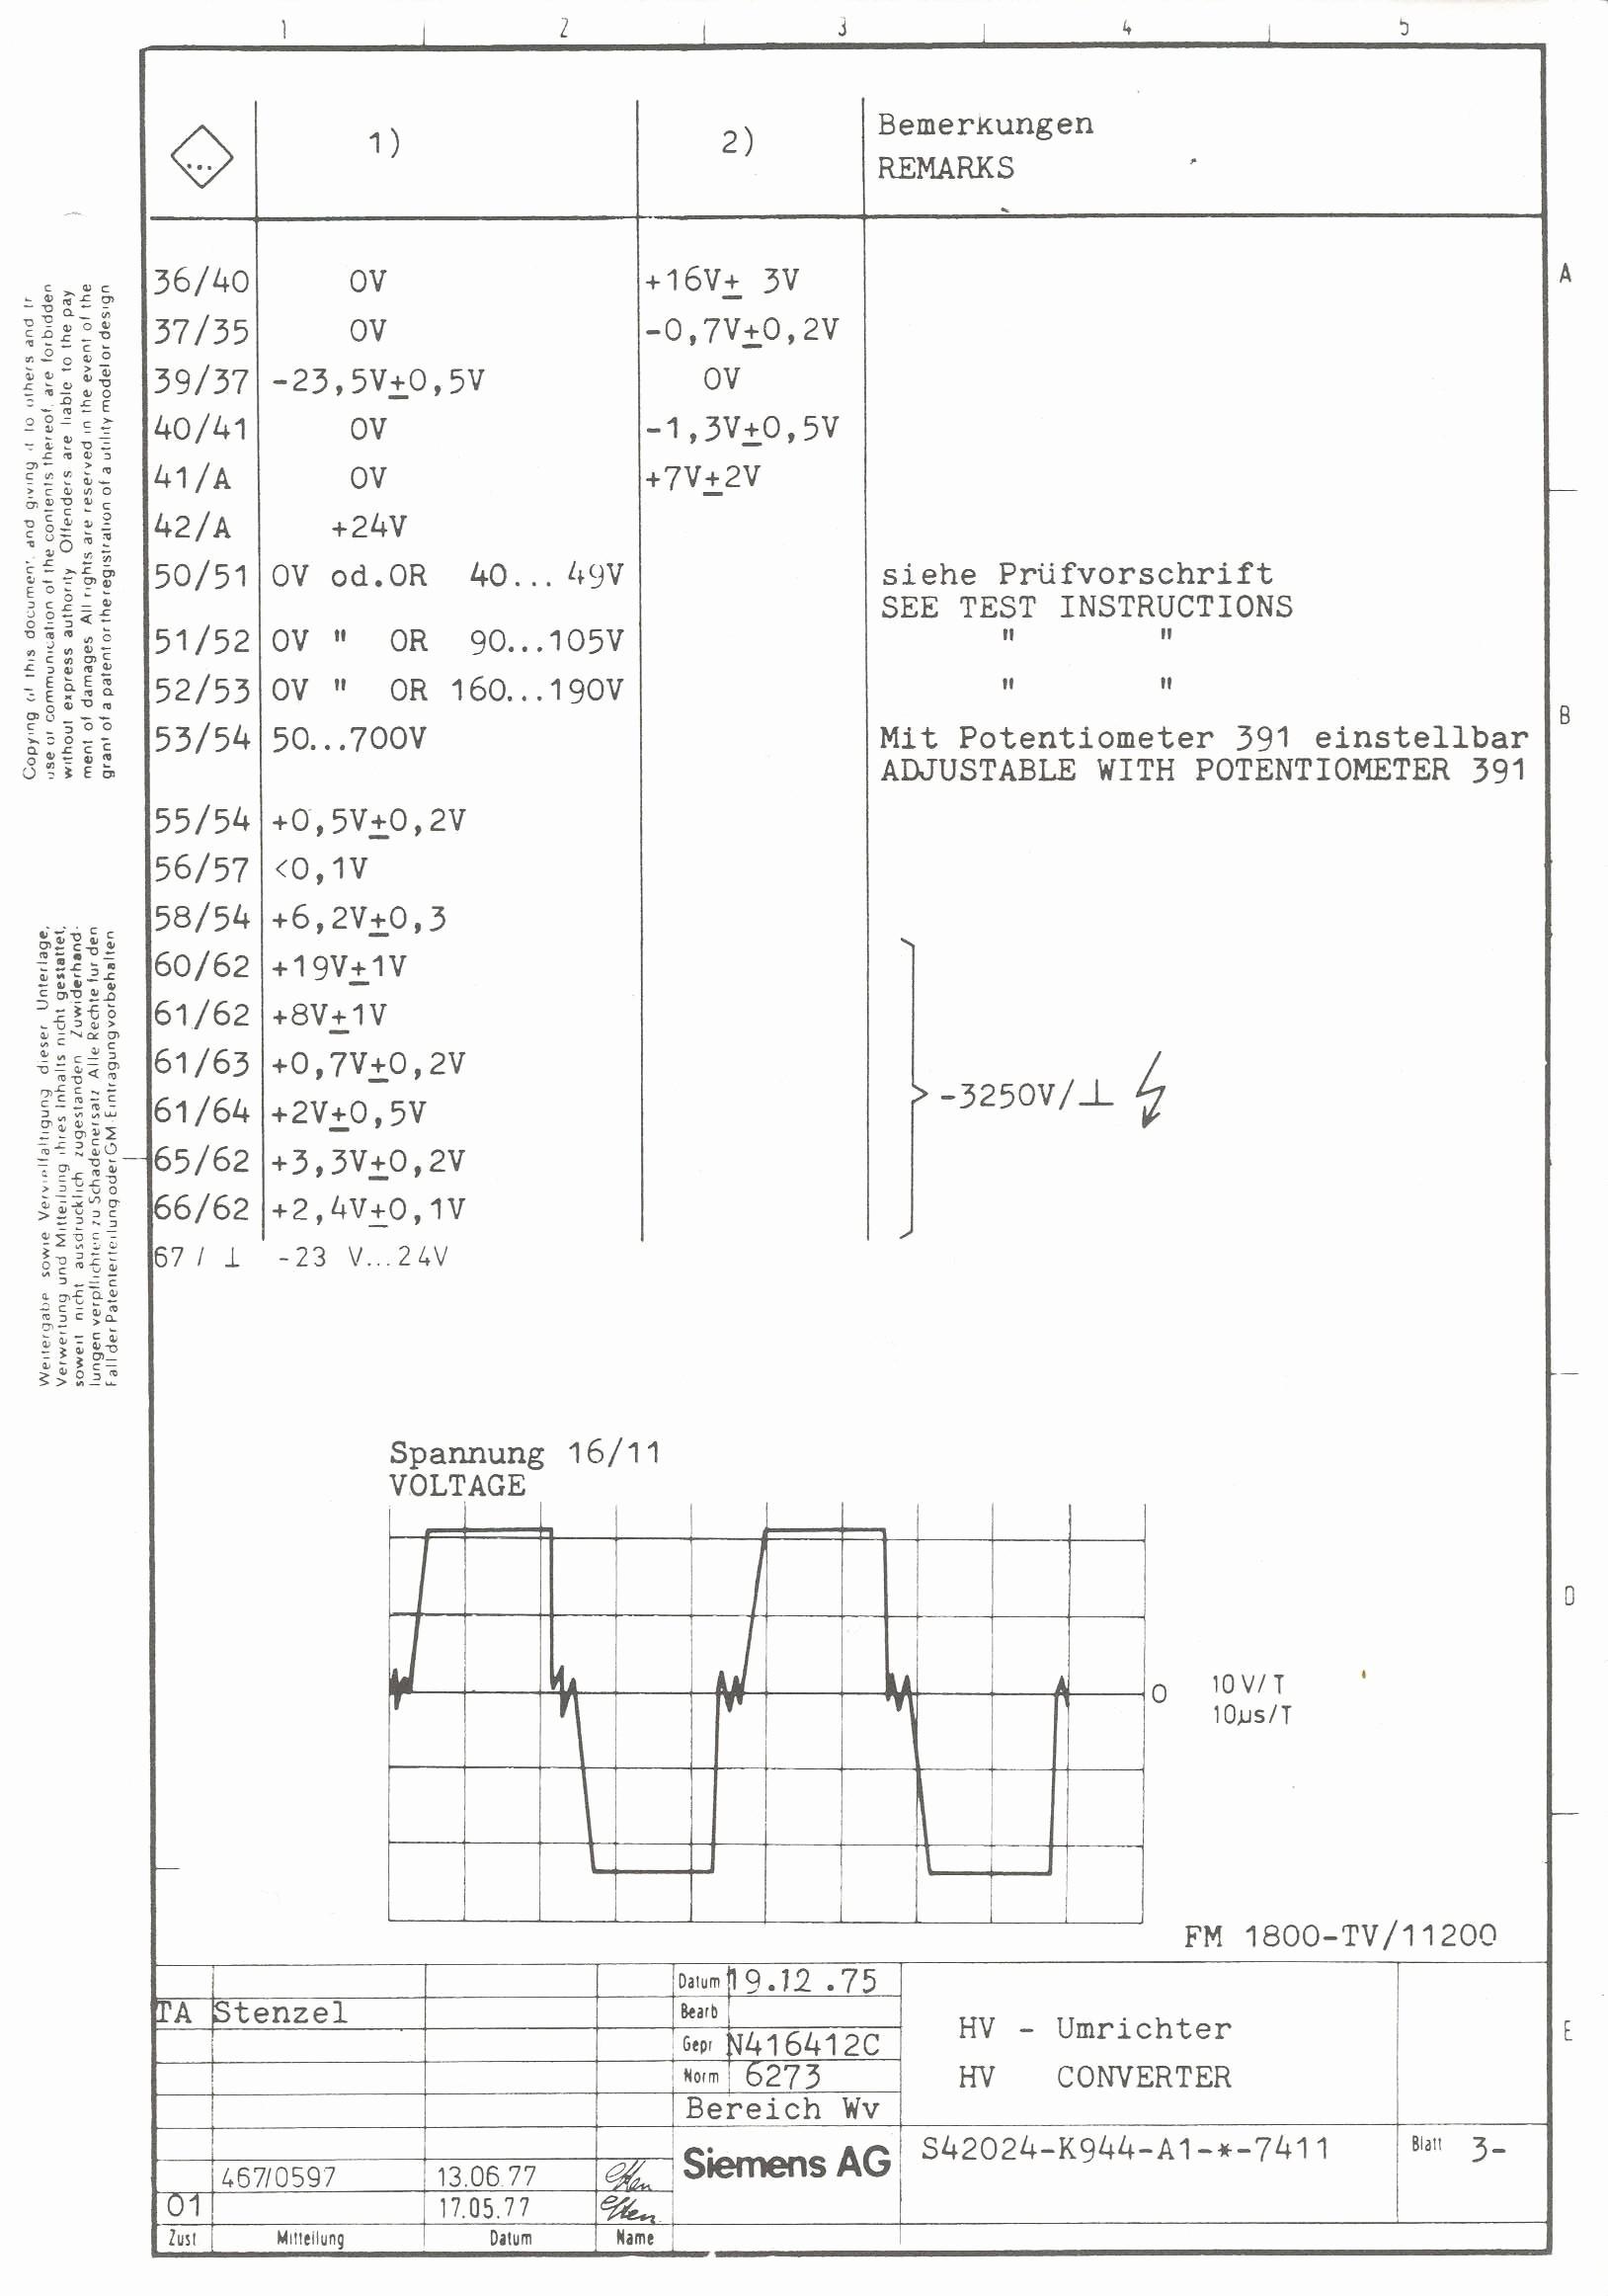 Subaru Impreza Wiring Diagram Factory Subwoofer Wiring Diagram 2006 Subaru Impreza 2 5i Of Subaru Impreza Wiring Diagram